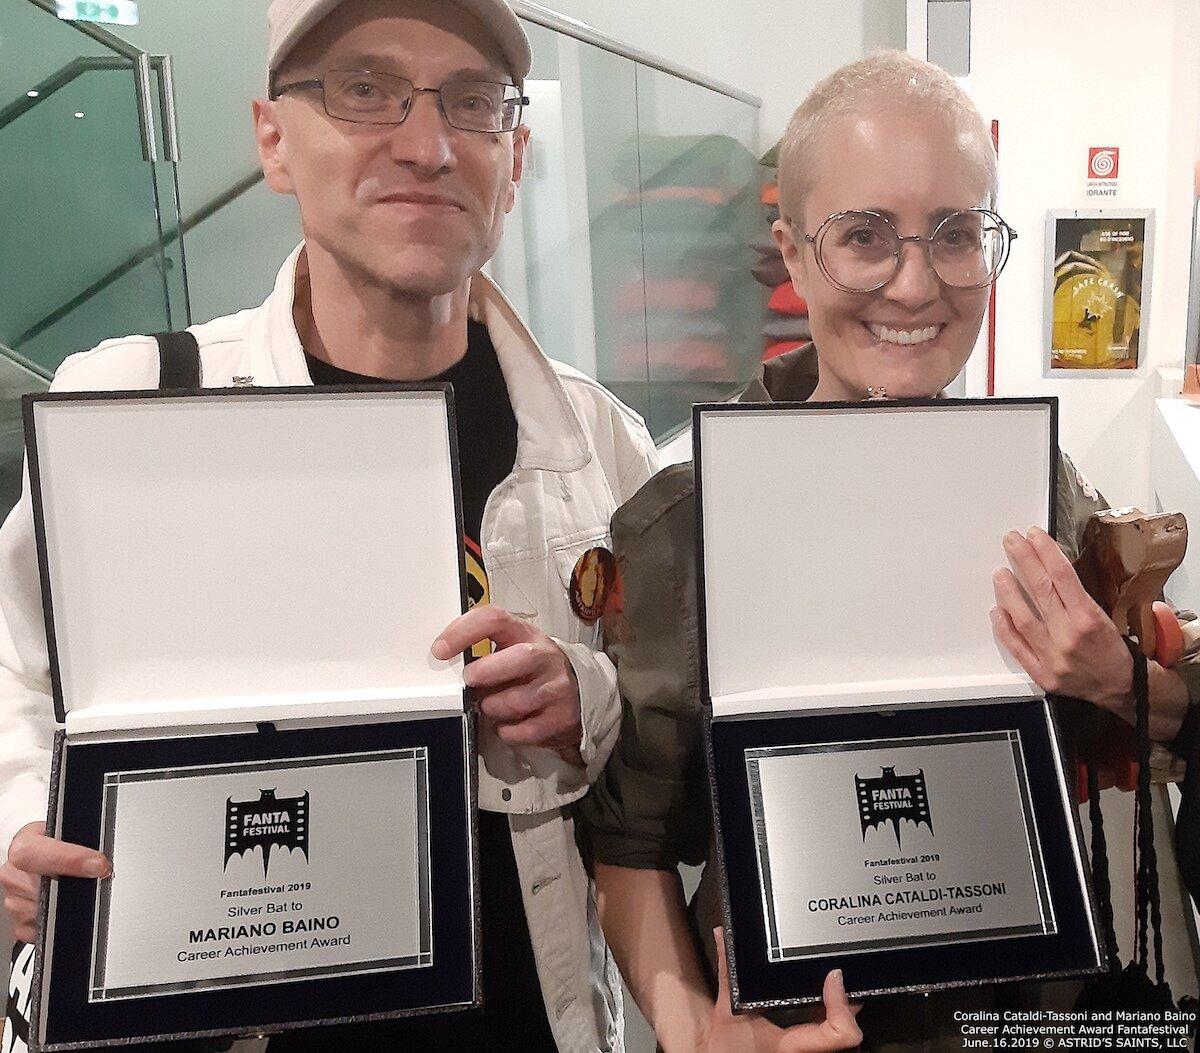 Coralina Cataldi-Tassoni and Mariano Baino Career Achivement Awards Fantafestival 2019 2019-09-18 at 4.44.32 PM.jpg